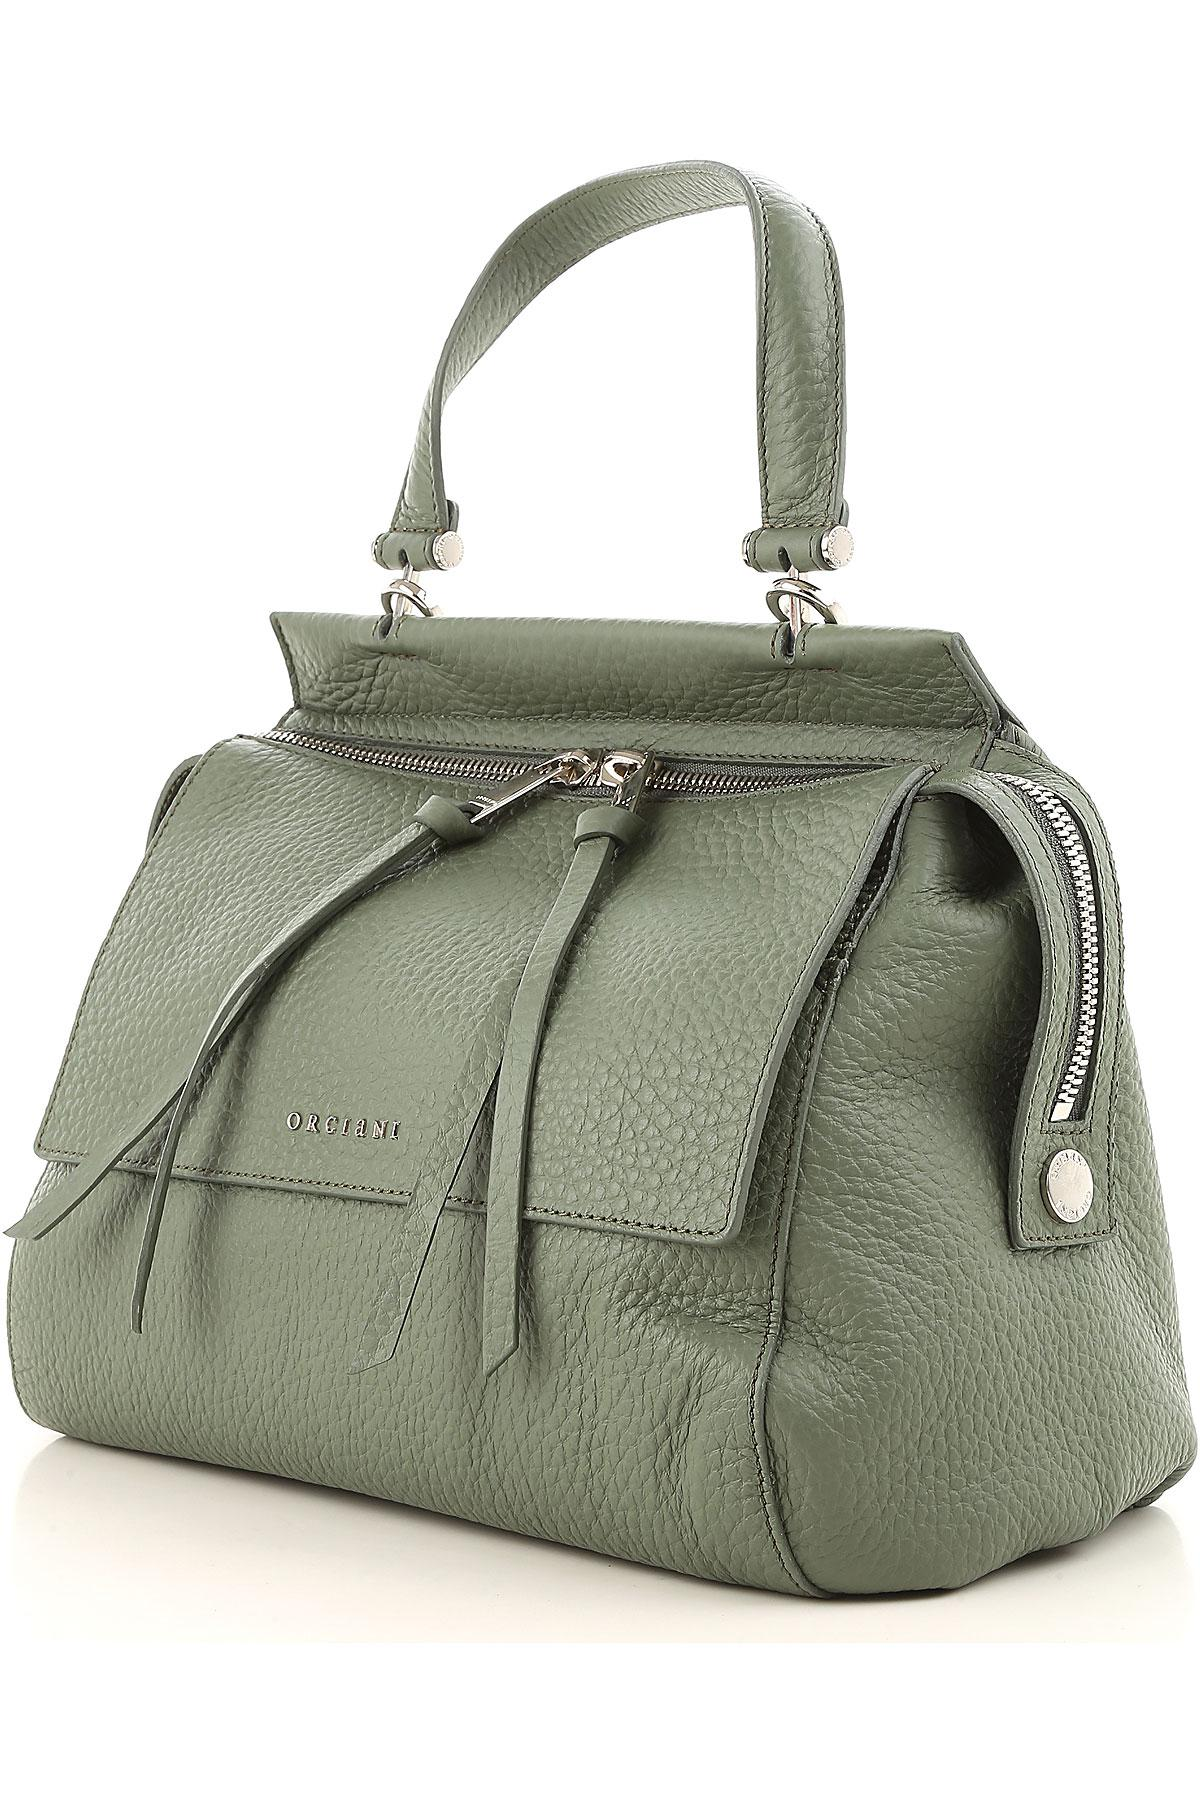 2a821db8d113 Orciani - Green Handbags - Lyst. View fullscreen